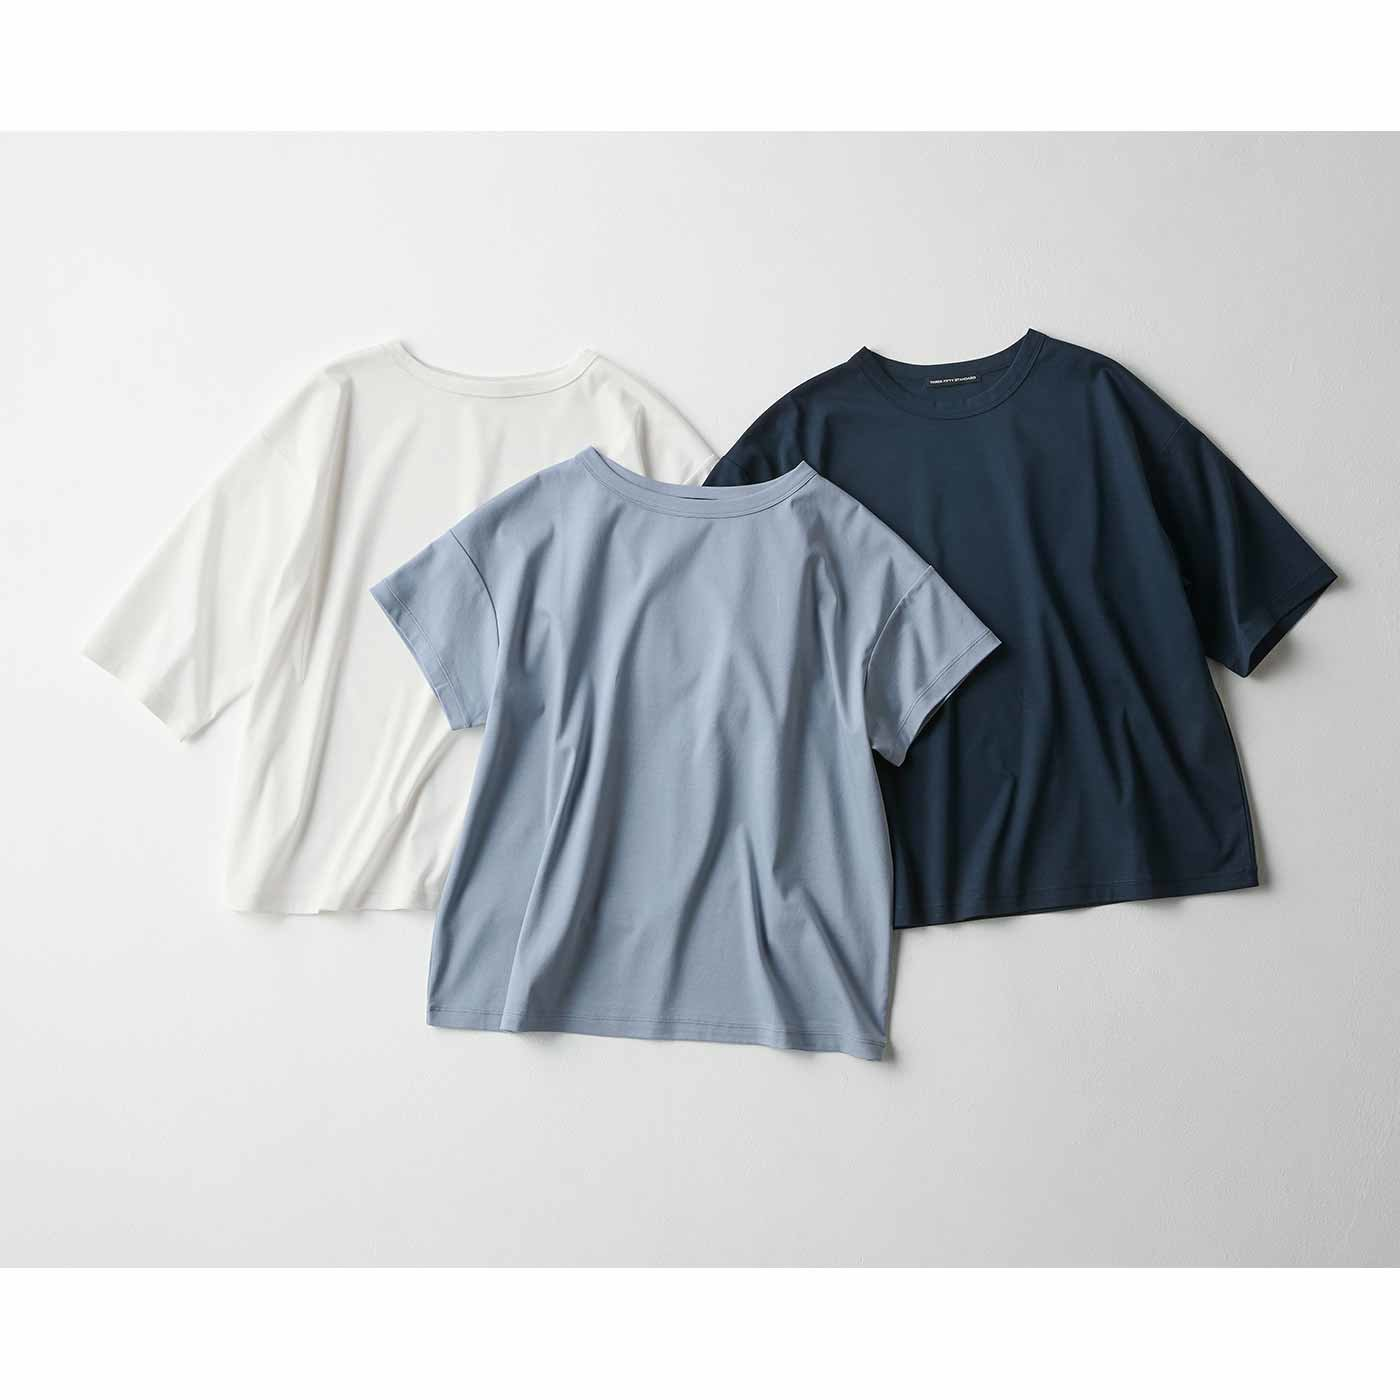 THREE FIFTY STANDARD シルケット加工のこなれたTシャツの会